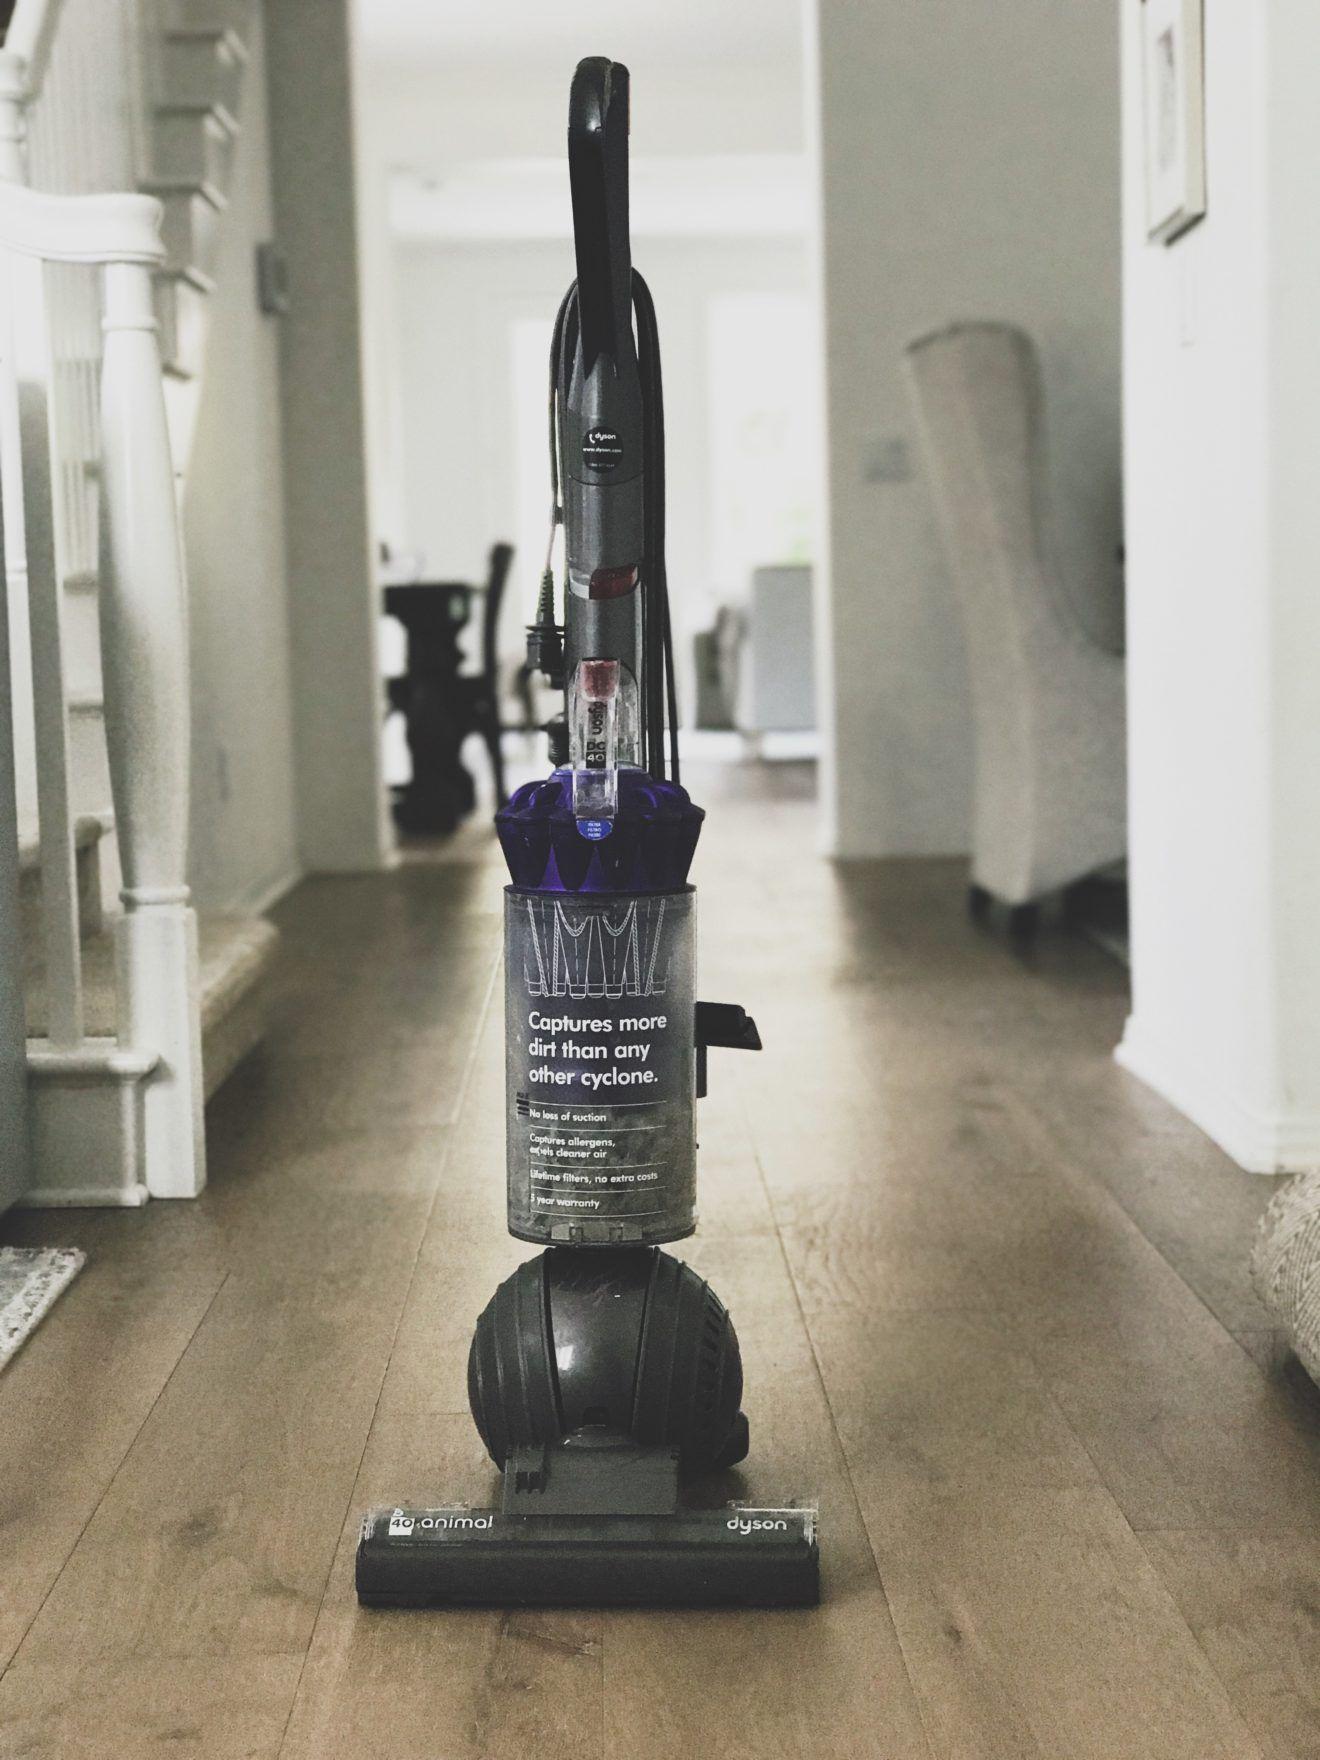 SUPER good Dyson deal! Best vacuum, Best black friday